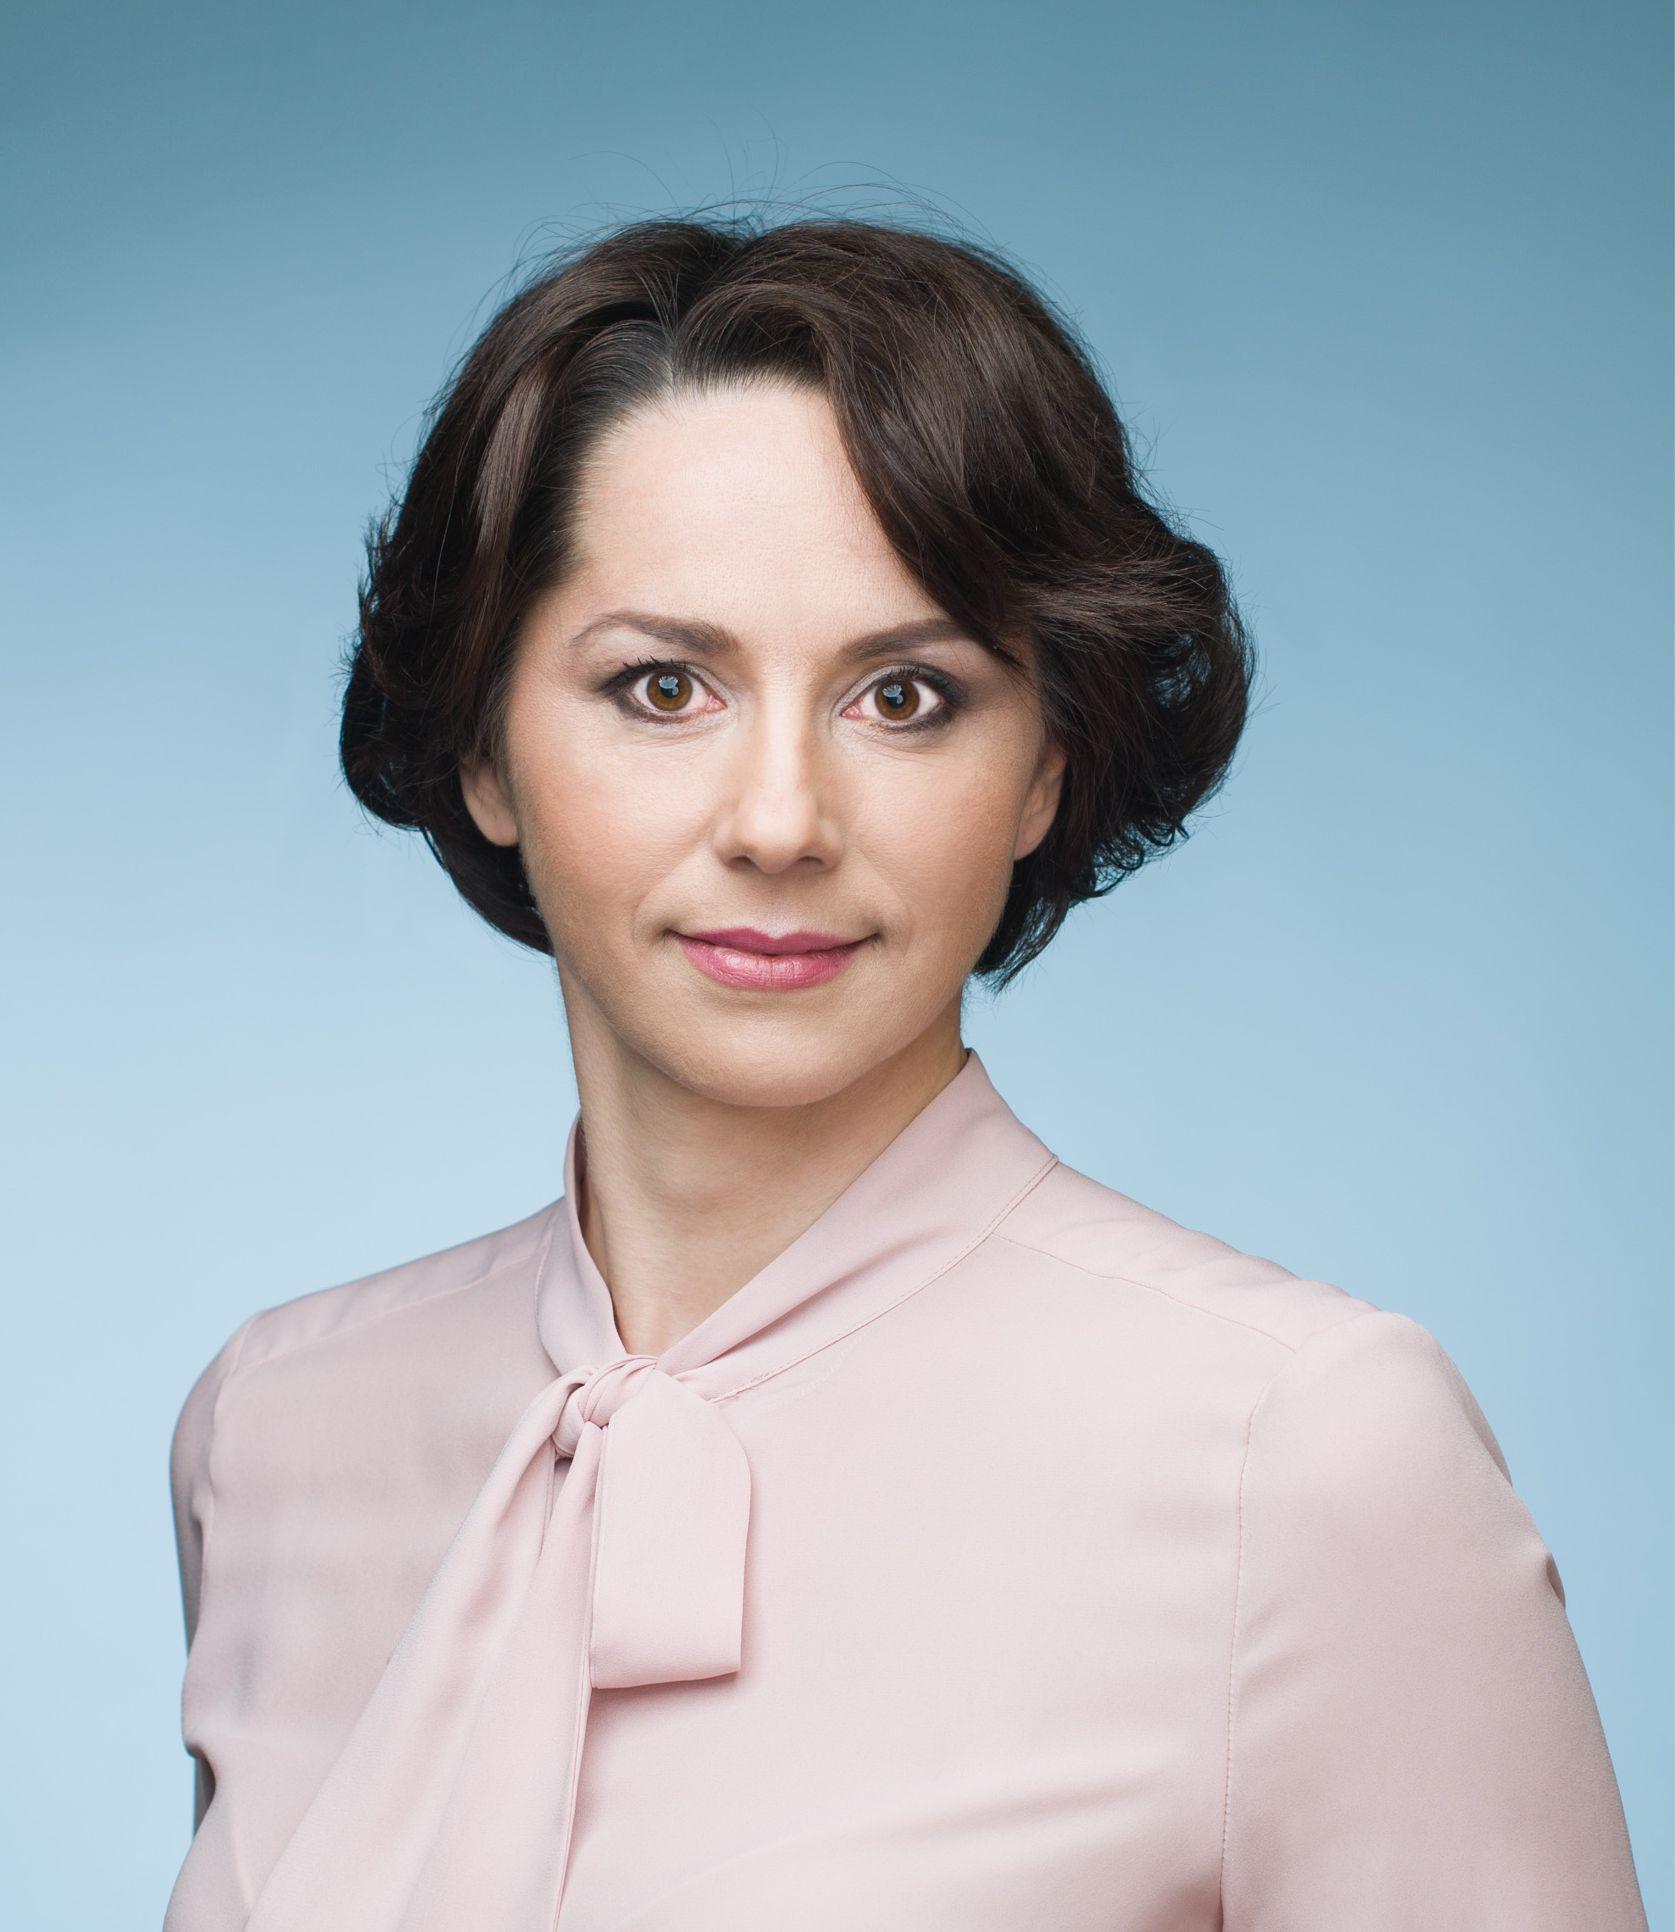 Оксана Пучковская